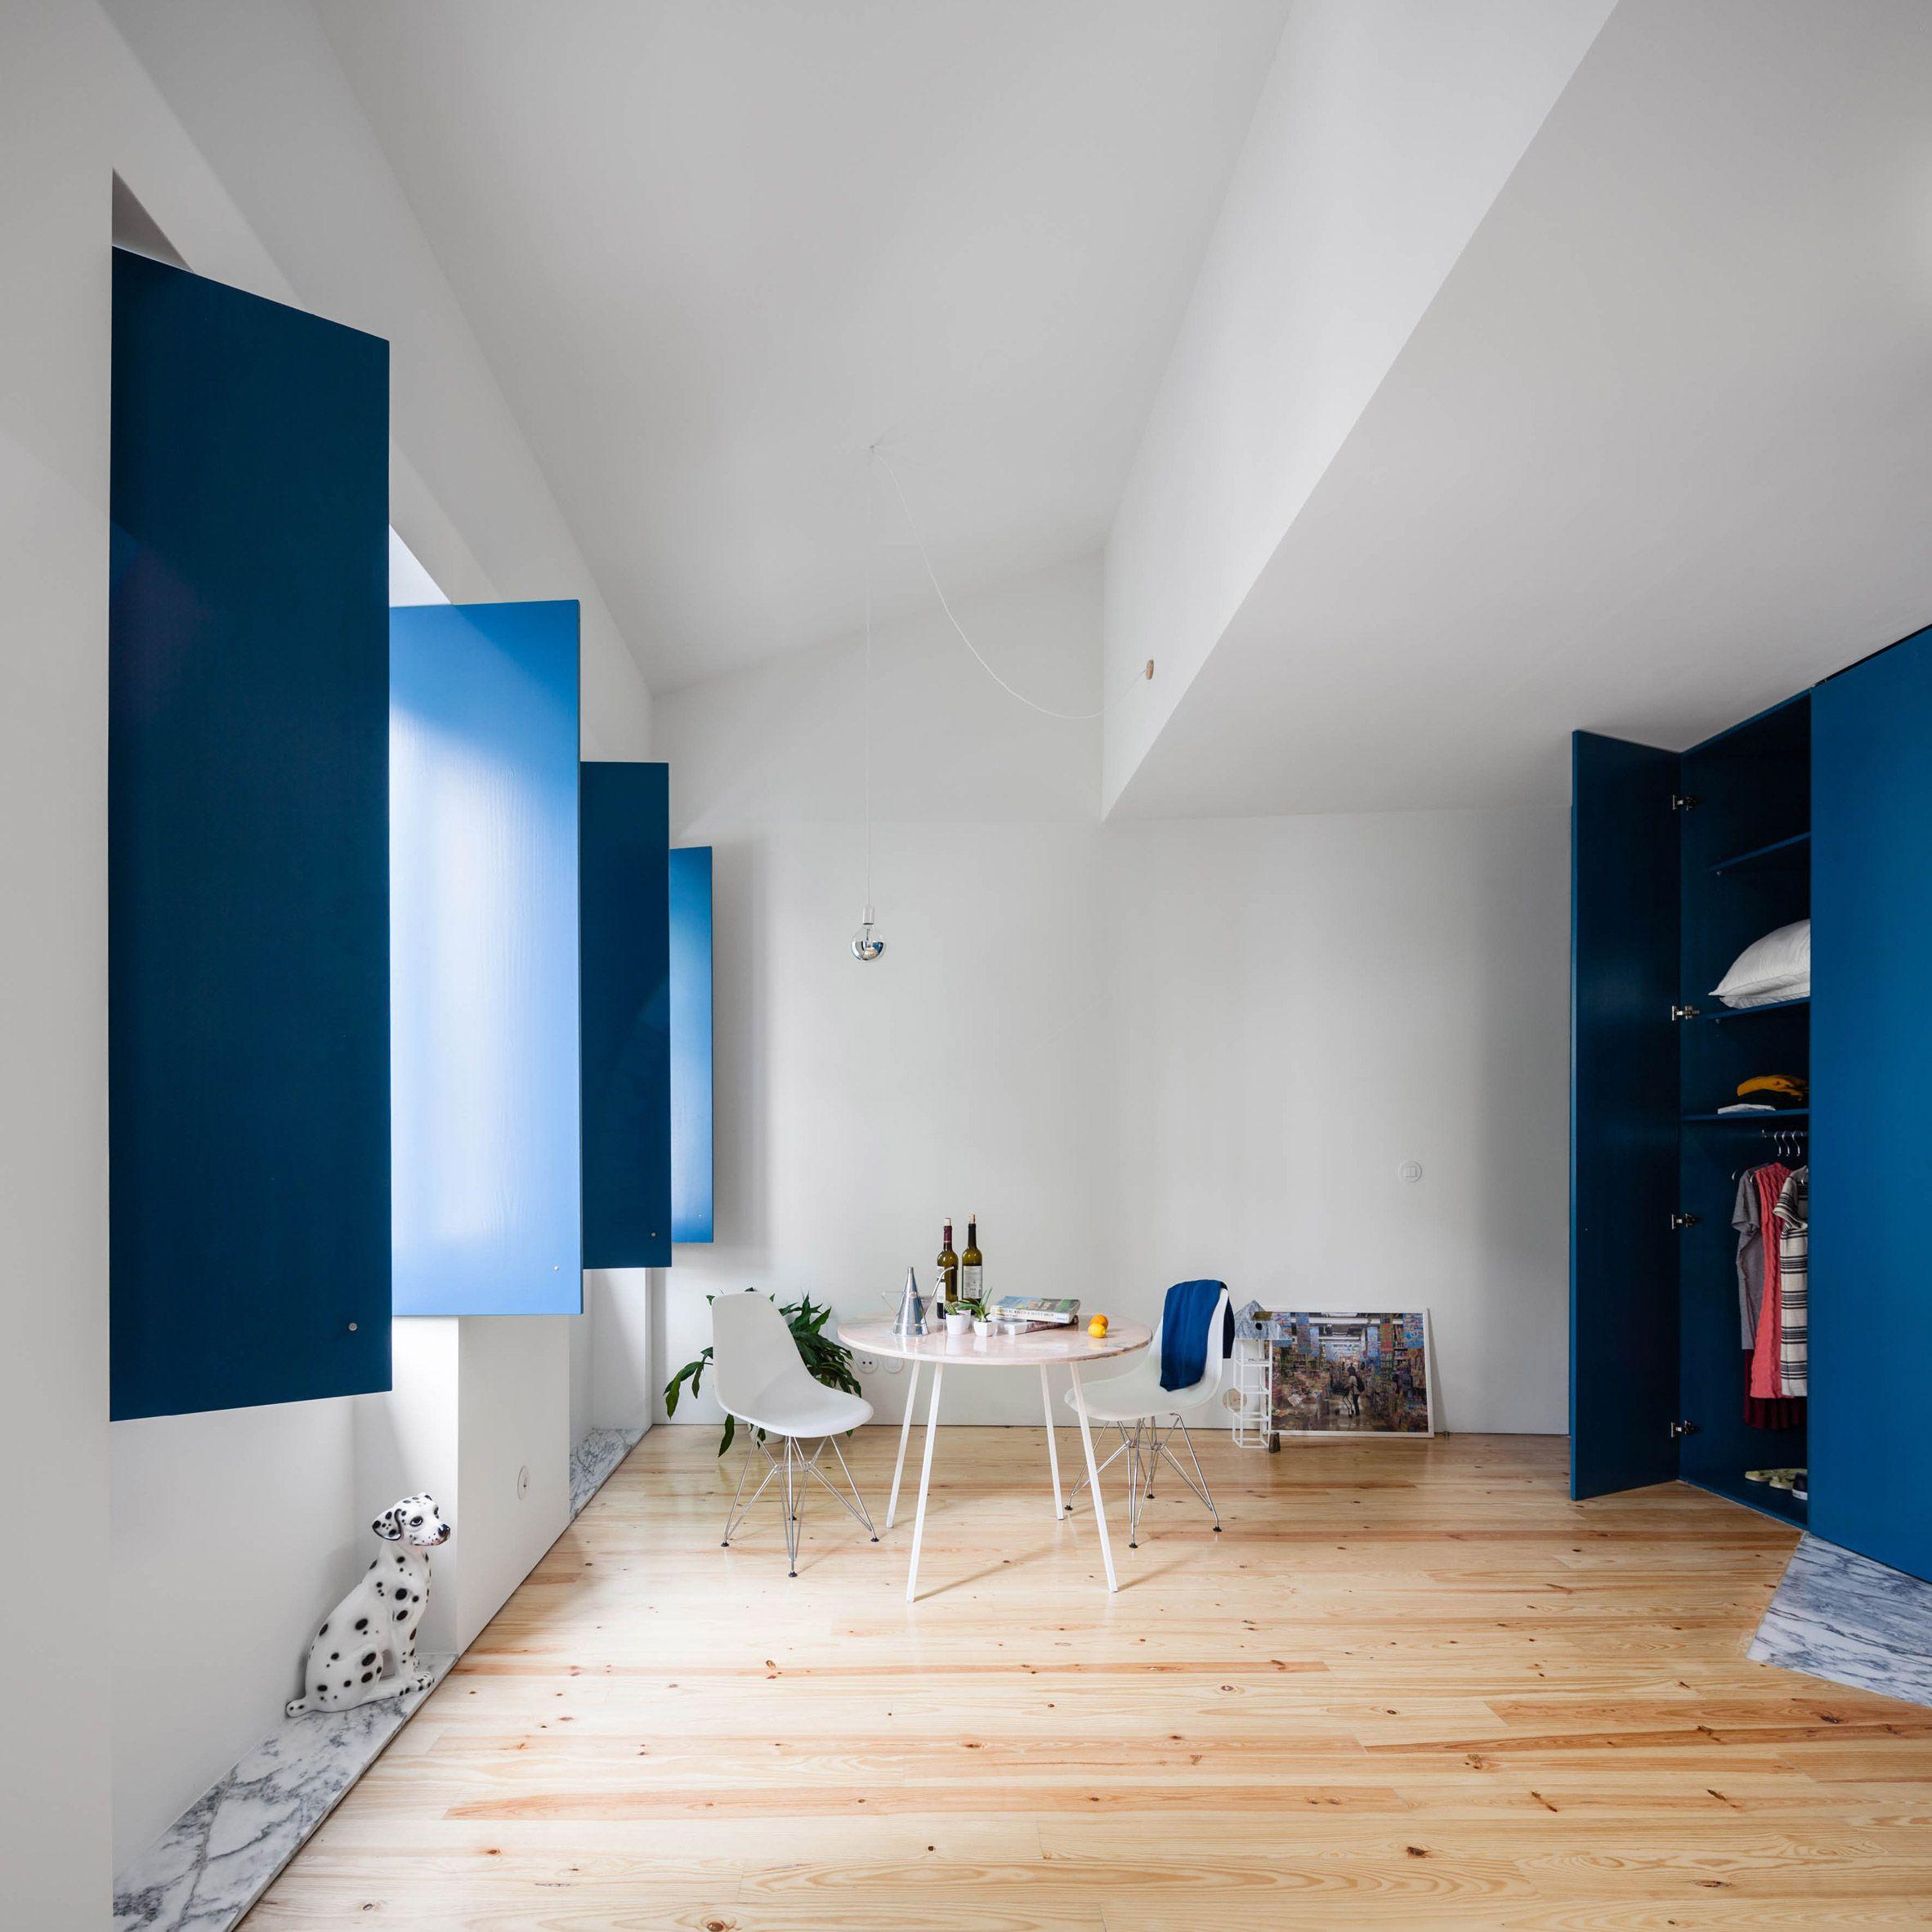 House in rua faria guimãres by fala atelier interior design color schemes colorful interior design